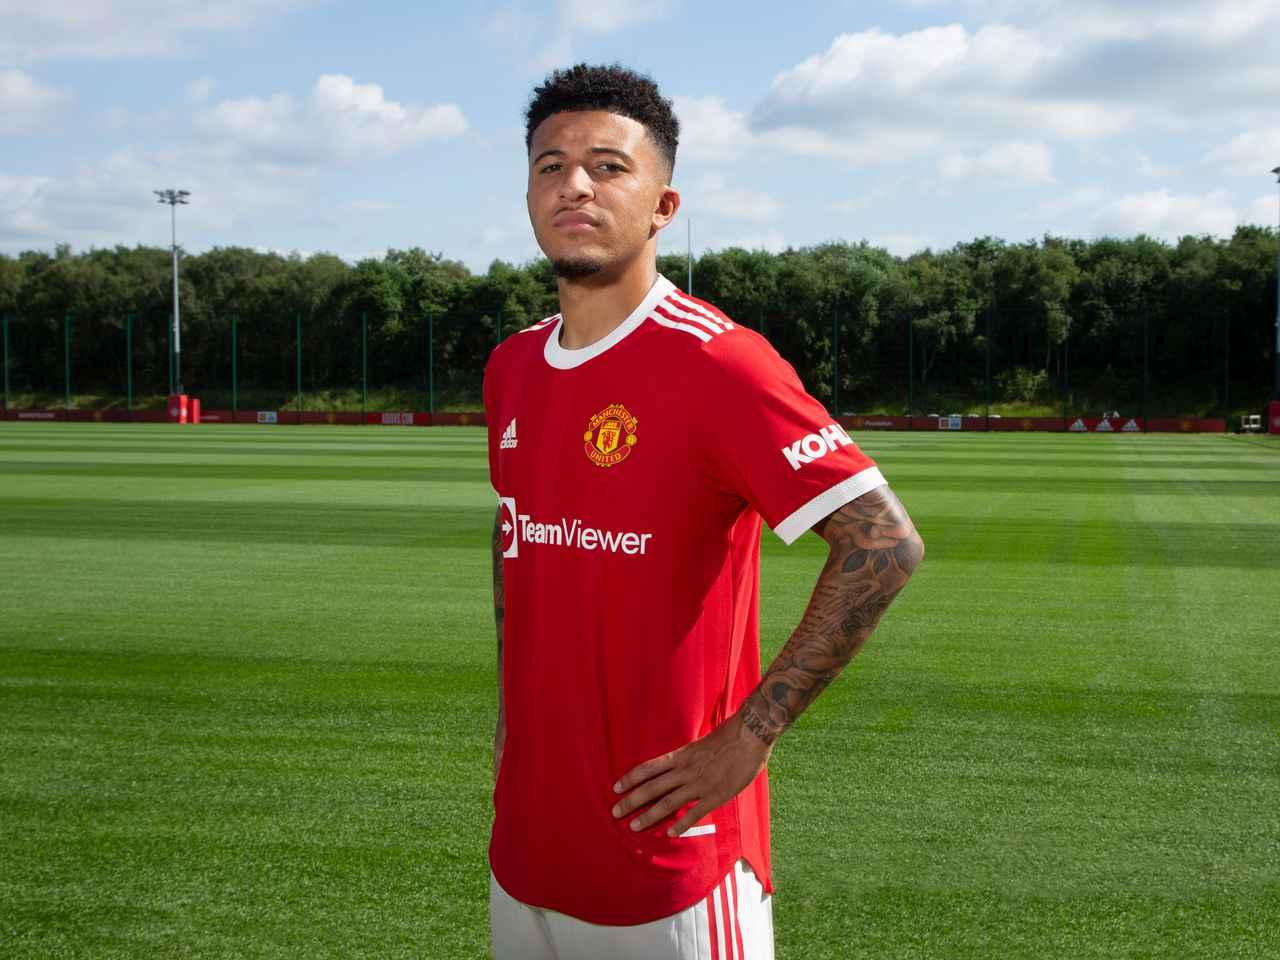 Jadon Sancho es anunciado como refuerzo de Manchester United tras ser vendido por Borussia Dortmund